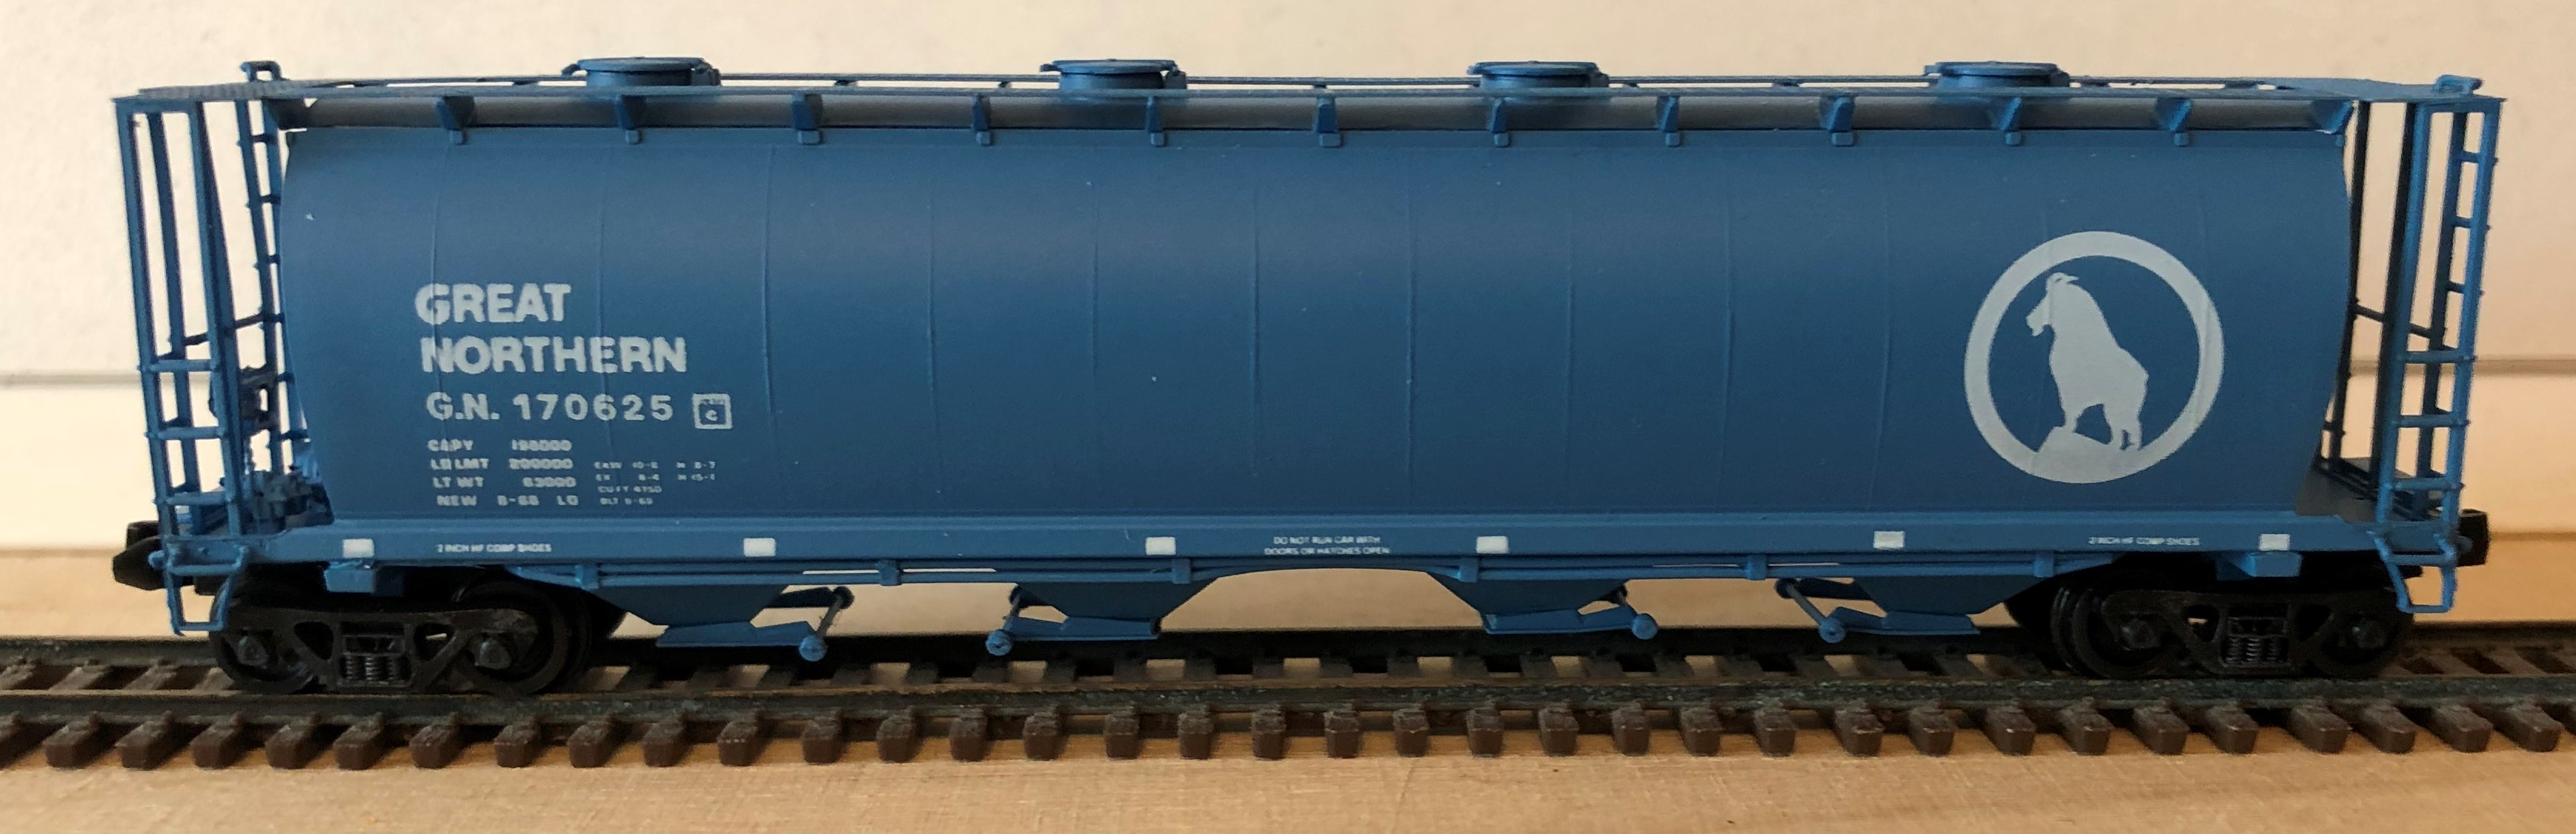 N Scale - Brooklyn Locomotive Works - BLW-1137-B4 - Covered Hopper, 4-Bay, Cylindrical - Great Northern - 170625